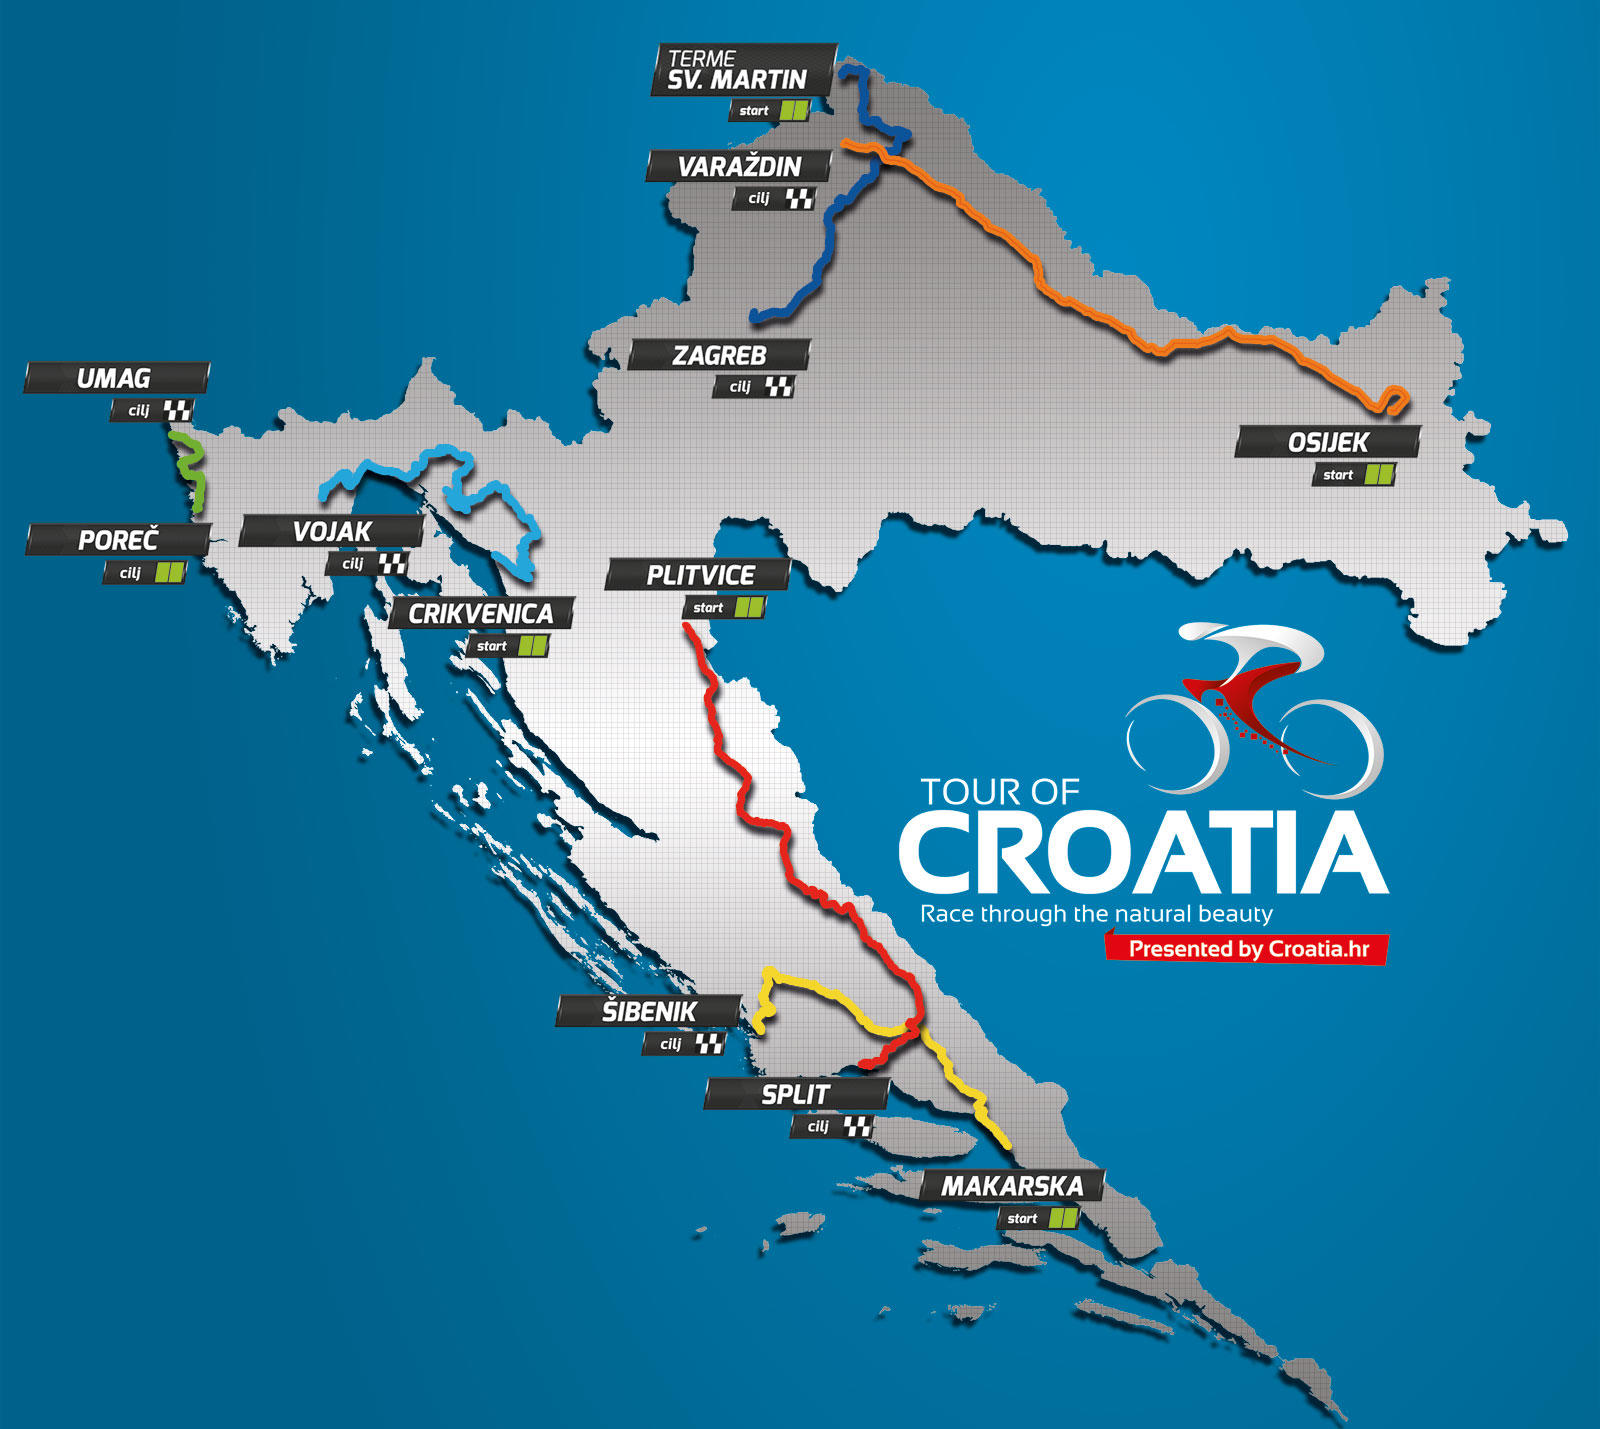 Карта маршрута Тура Хорватии 2016